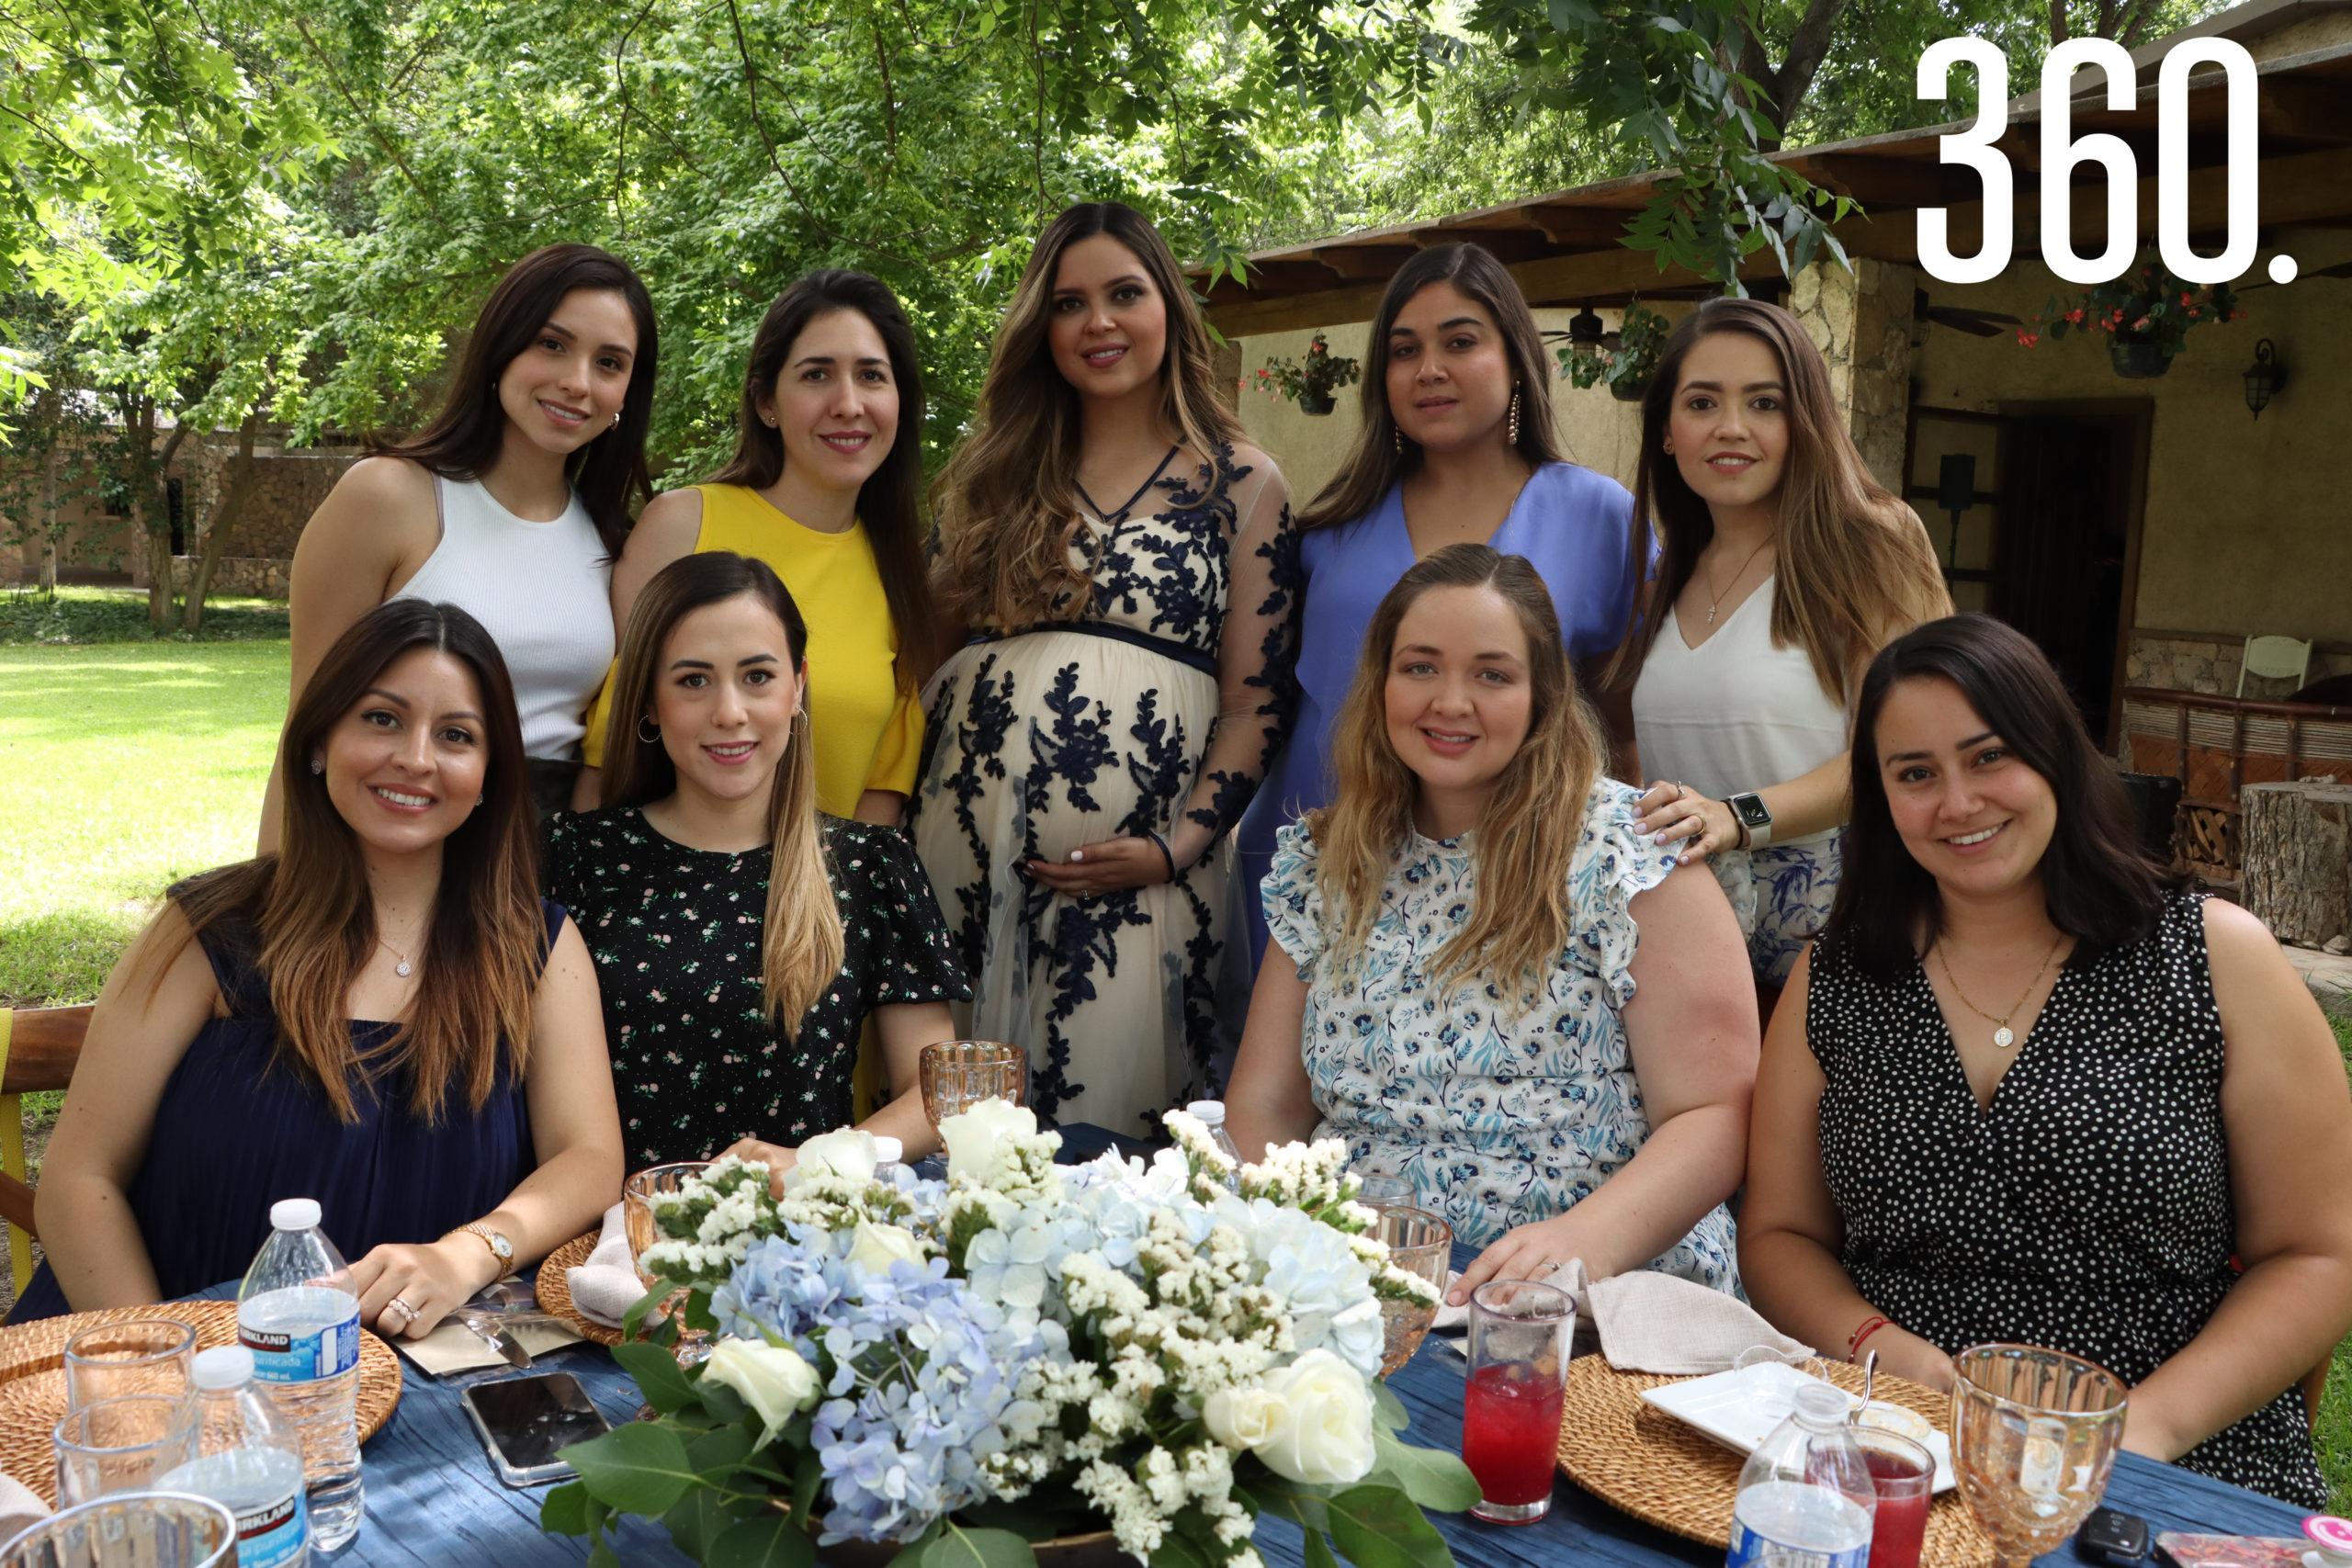 Fer Villarreal, Sofía Ancona, Gabriela de Peart, Ana Emilia Iga, Sofía García, Fernanda Villalobos, María Inés Chavira, Karla Verduzco y Paulina Rangel.